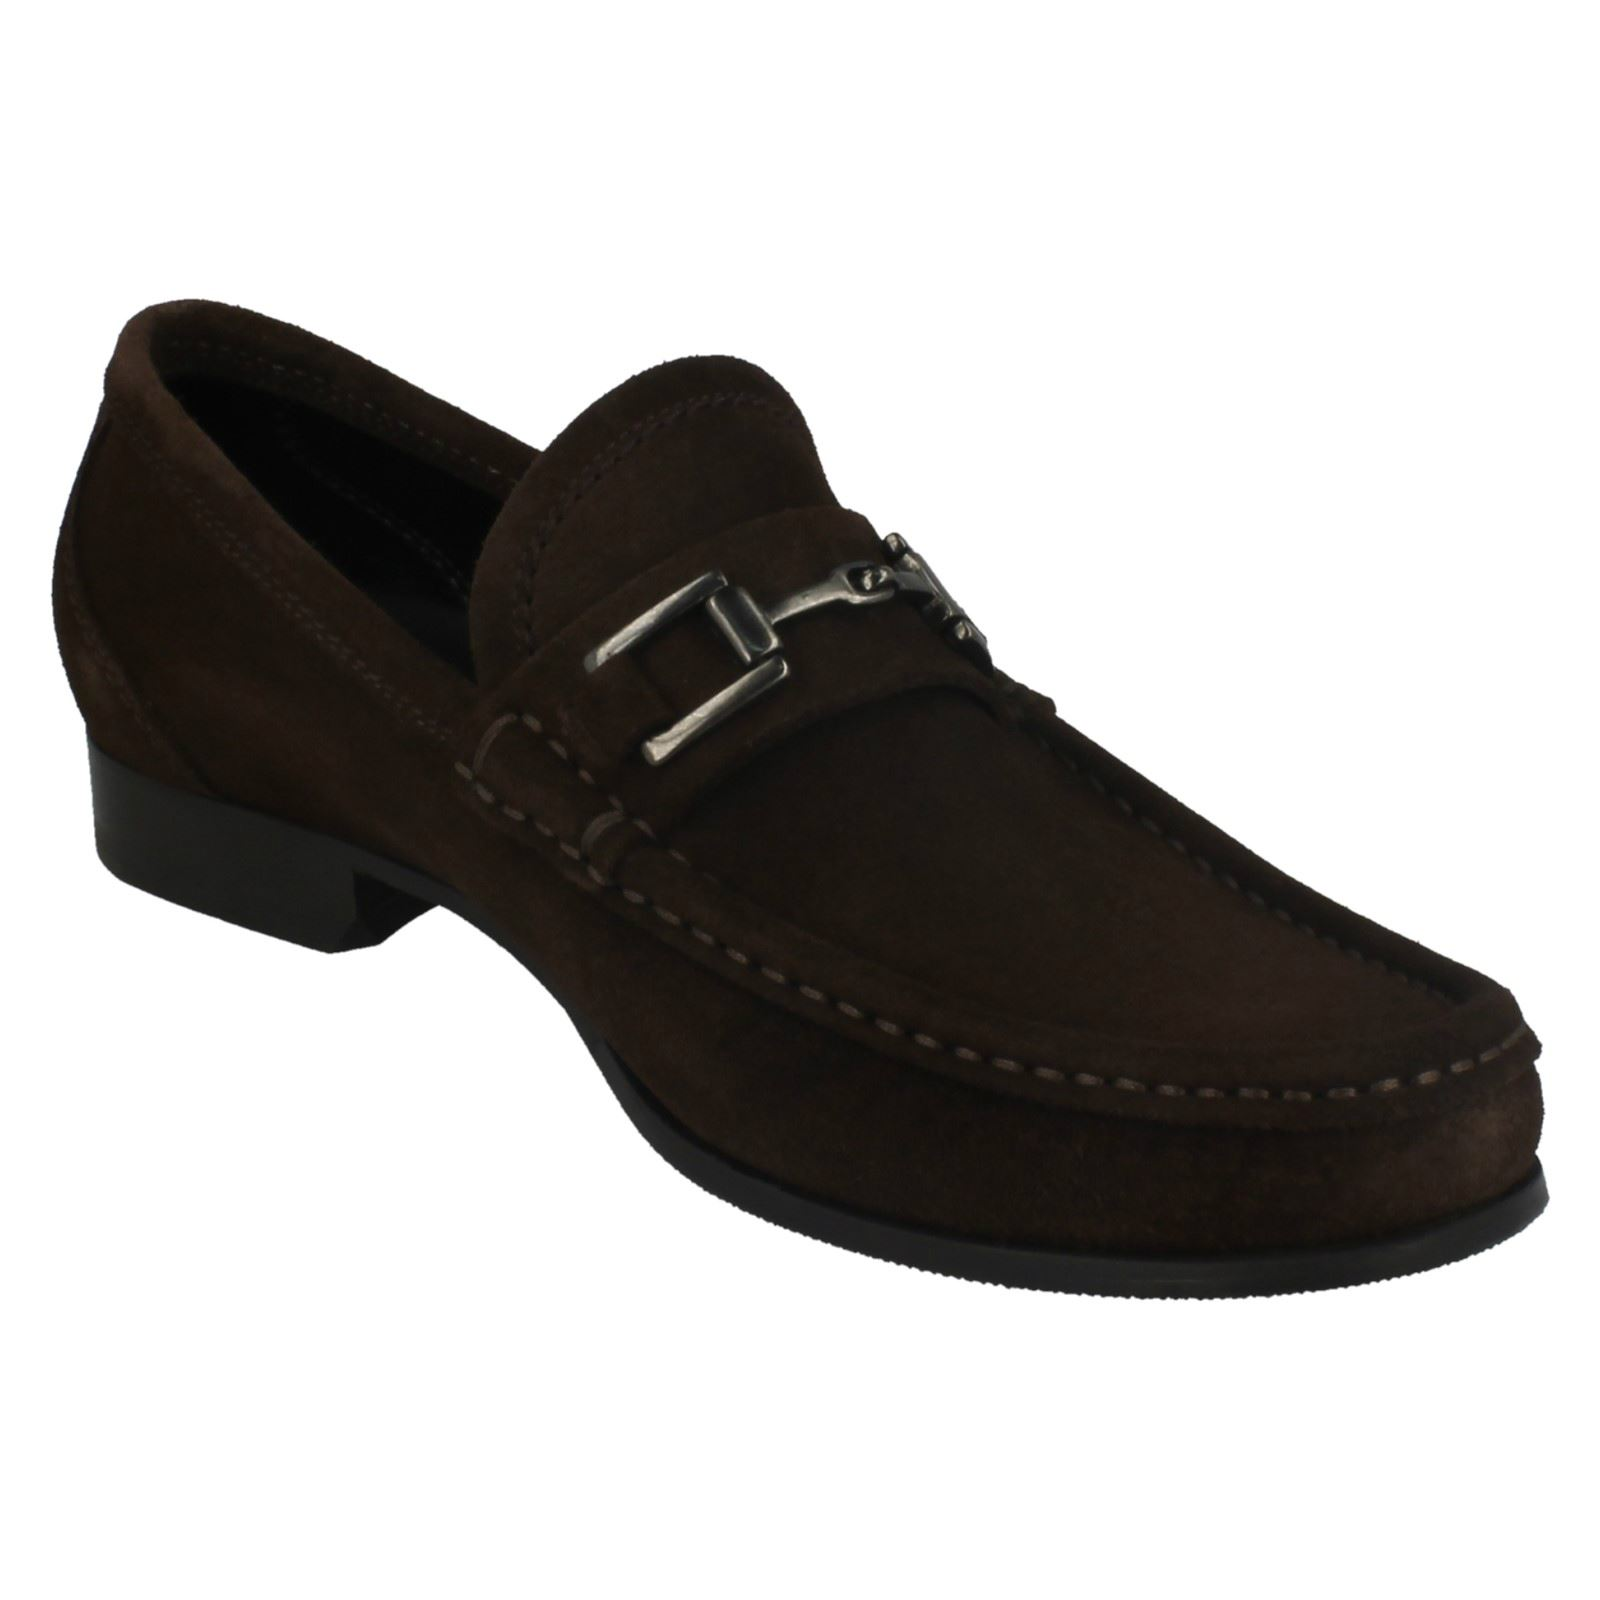 Uomo Schuhes Loake Moccasin Slip On Schuhes Uomo Verona 6f5b14